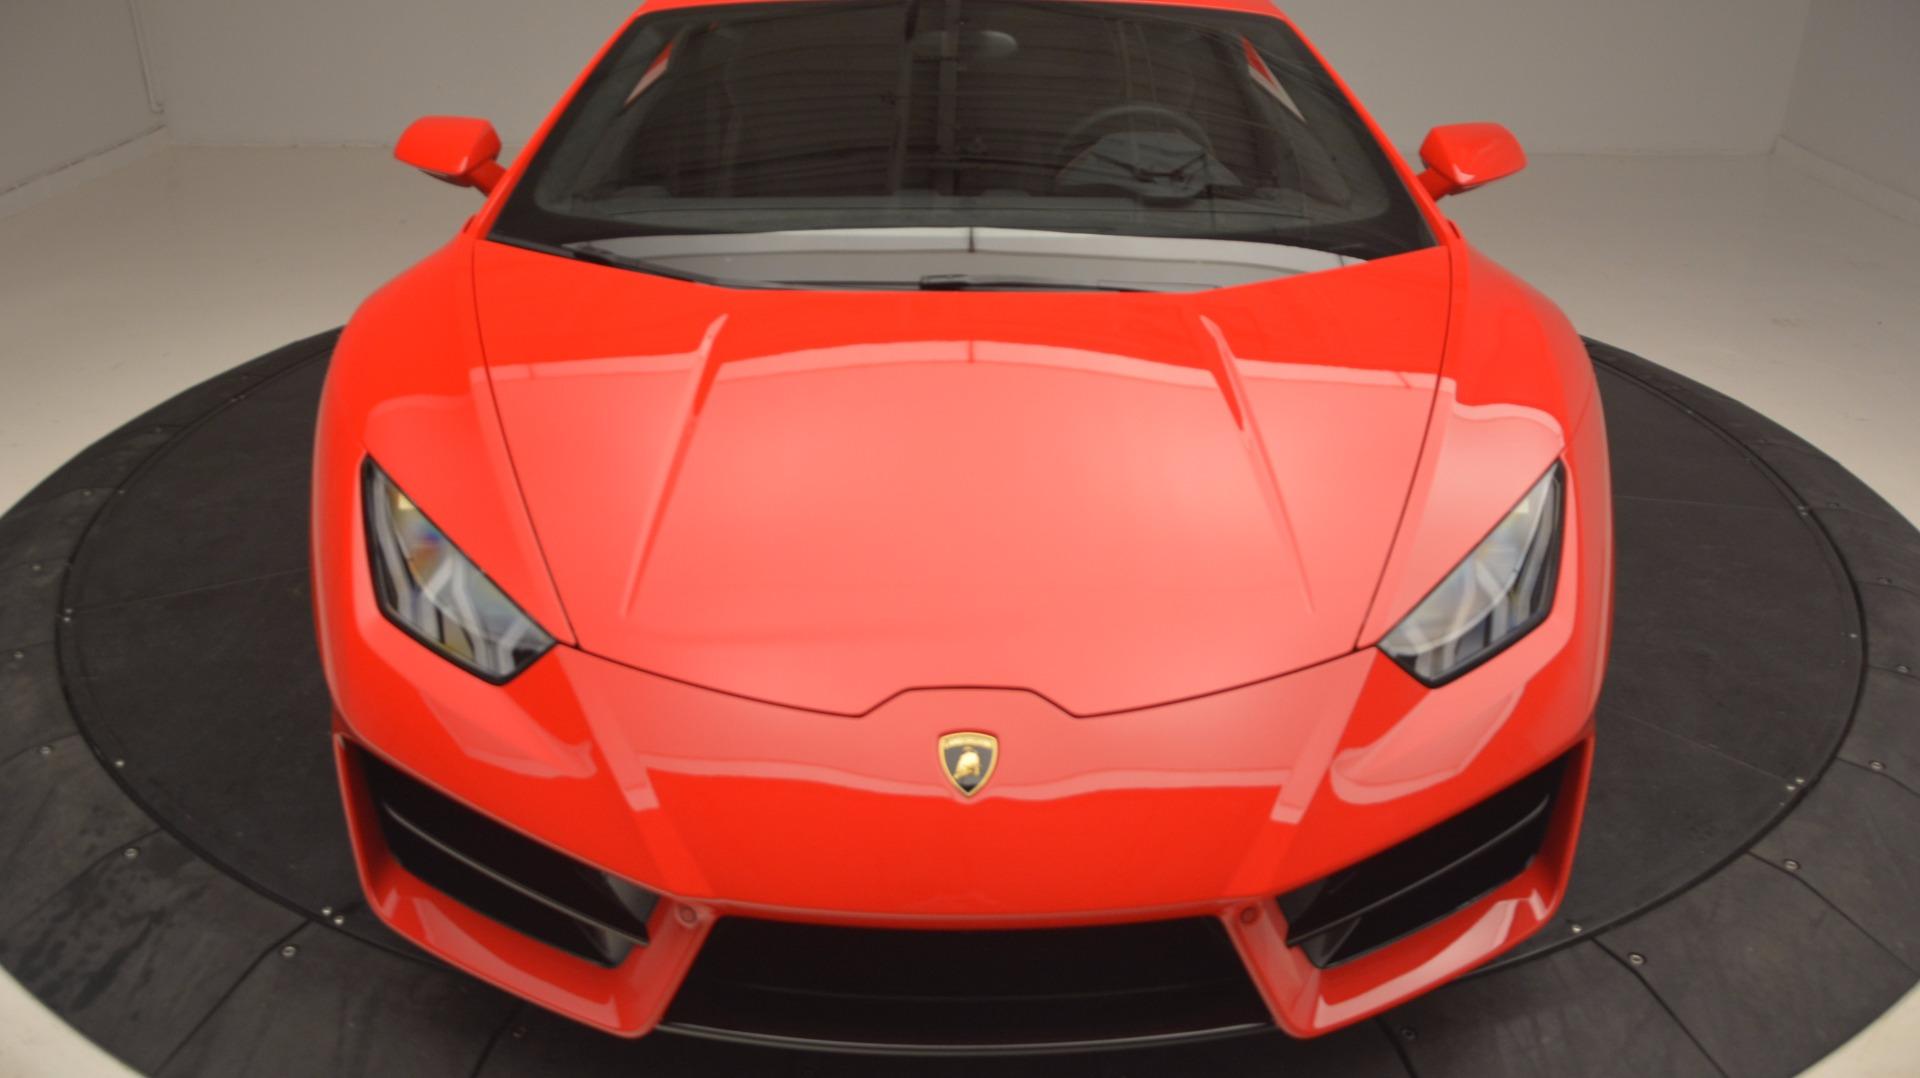 Used 2016 Lamborghini Huracan LP 580-2 For Sale In Greenwich, CT. Alfa Romeo of Greenwich, 7184 1070_p13